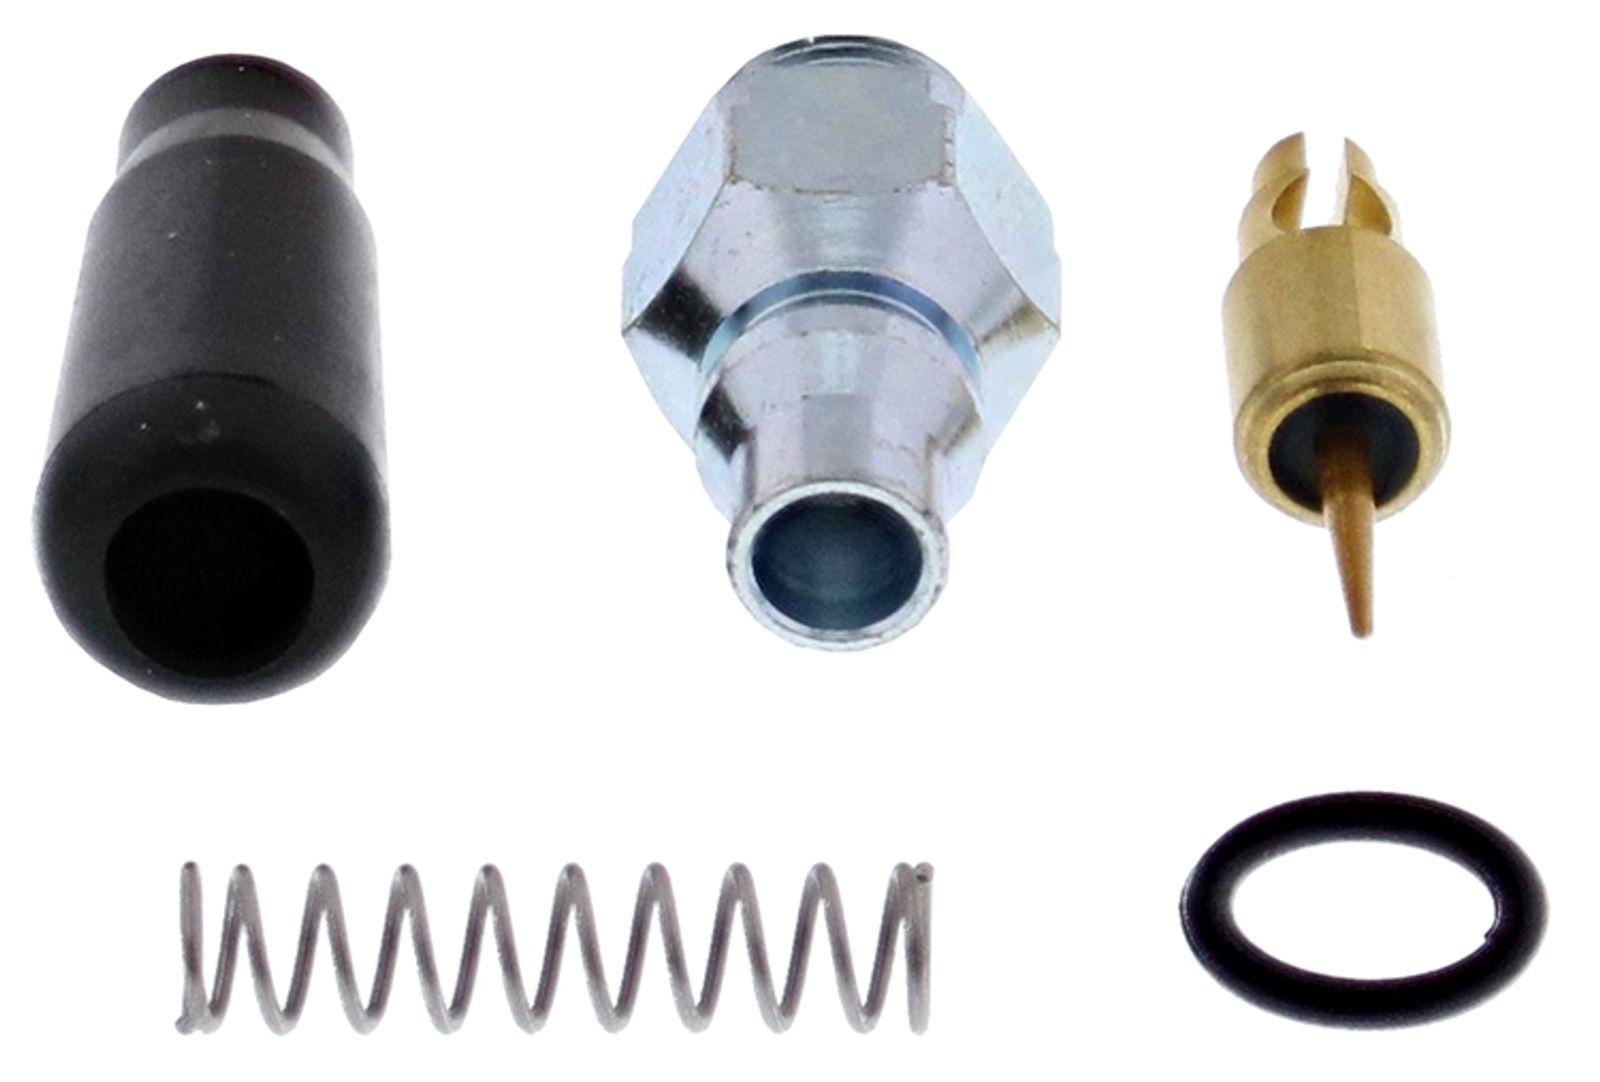 Wrp Choke Plunger Kits - WRP461020 image